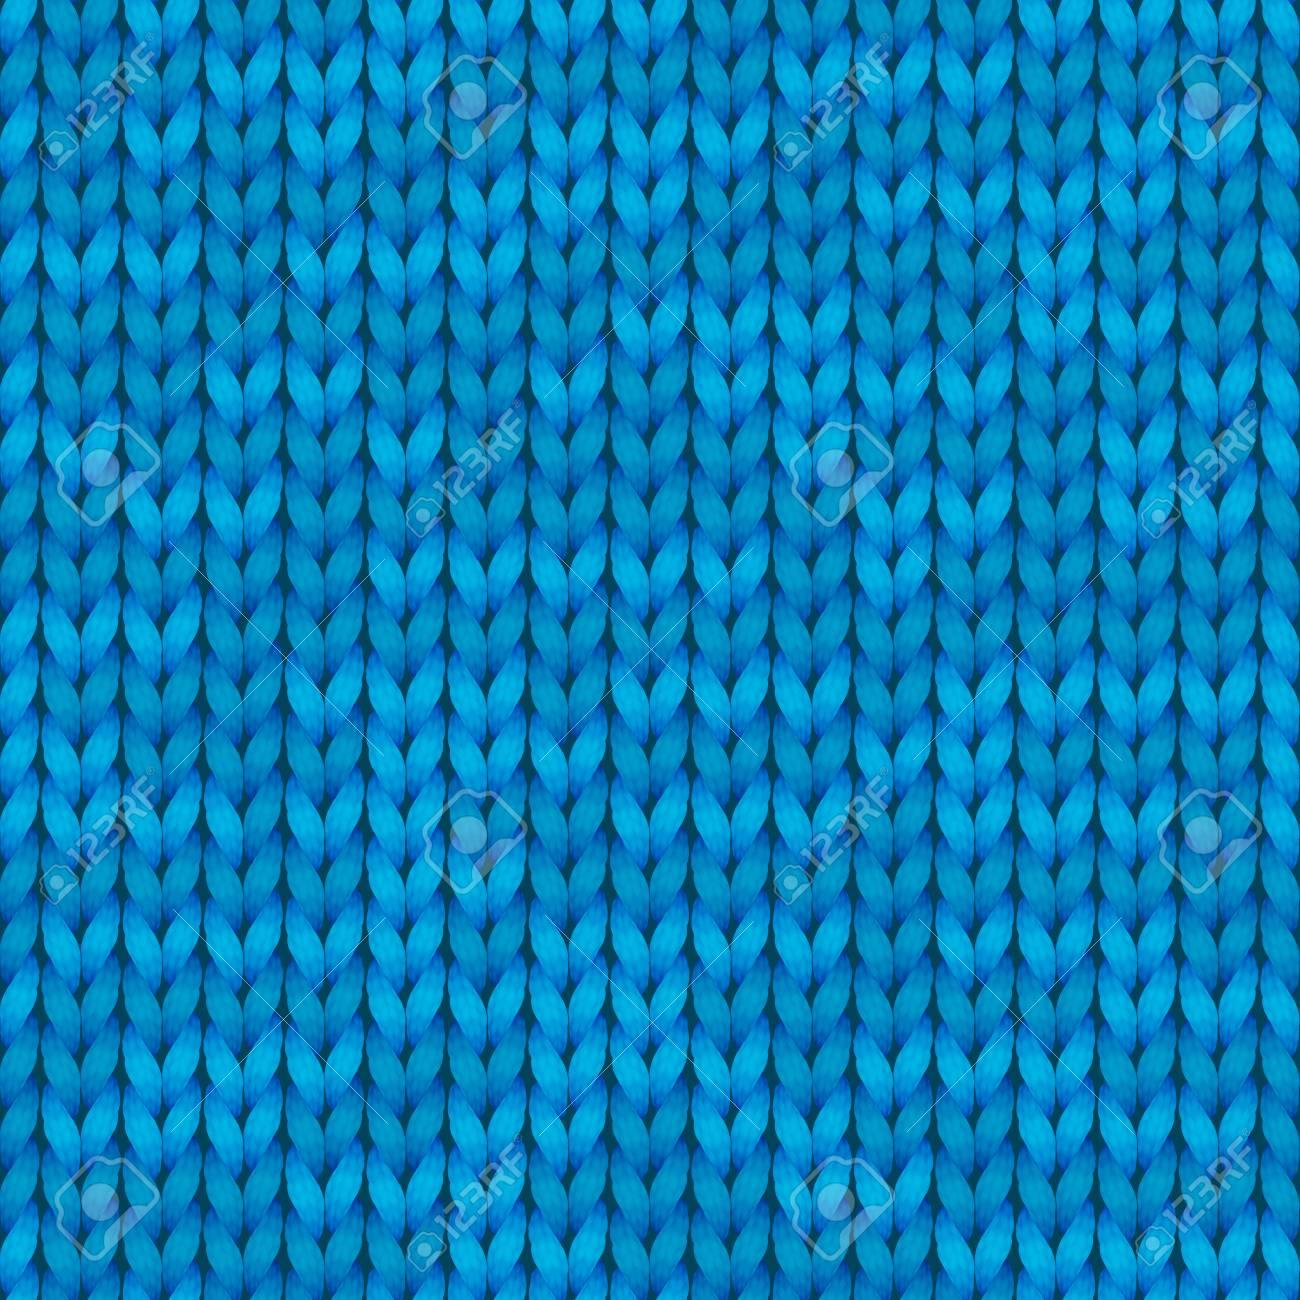 Light Blue Realistic Knit Texture Seamless Pattern Seamless